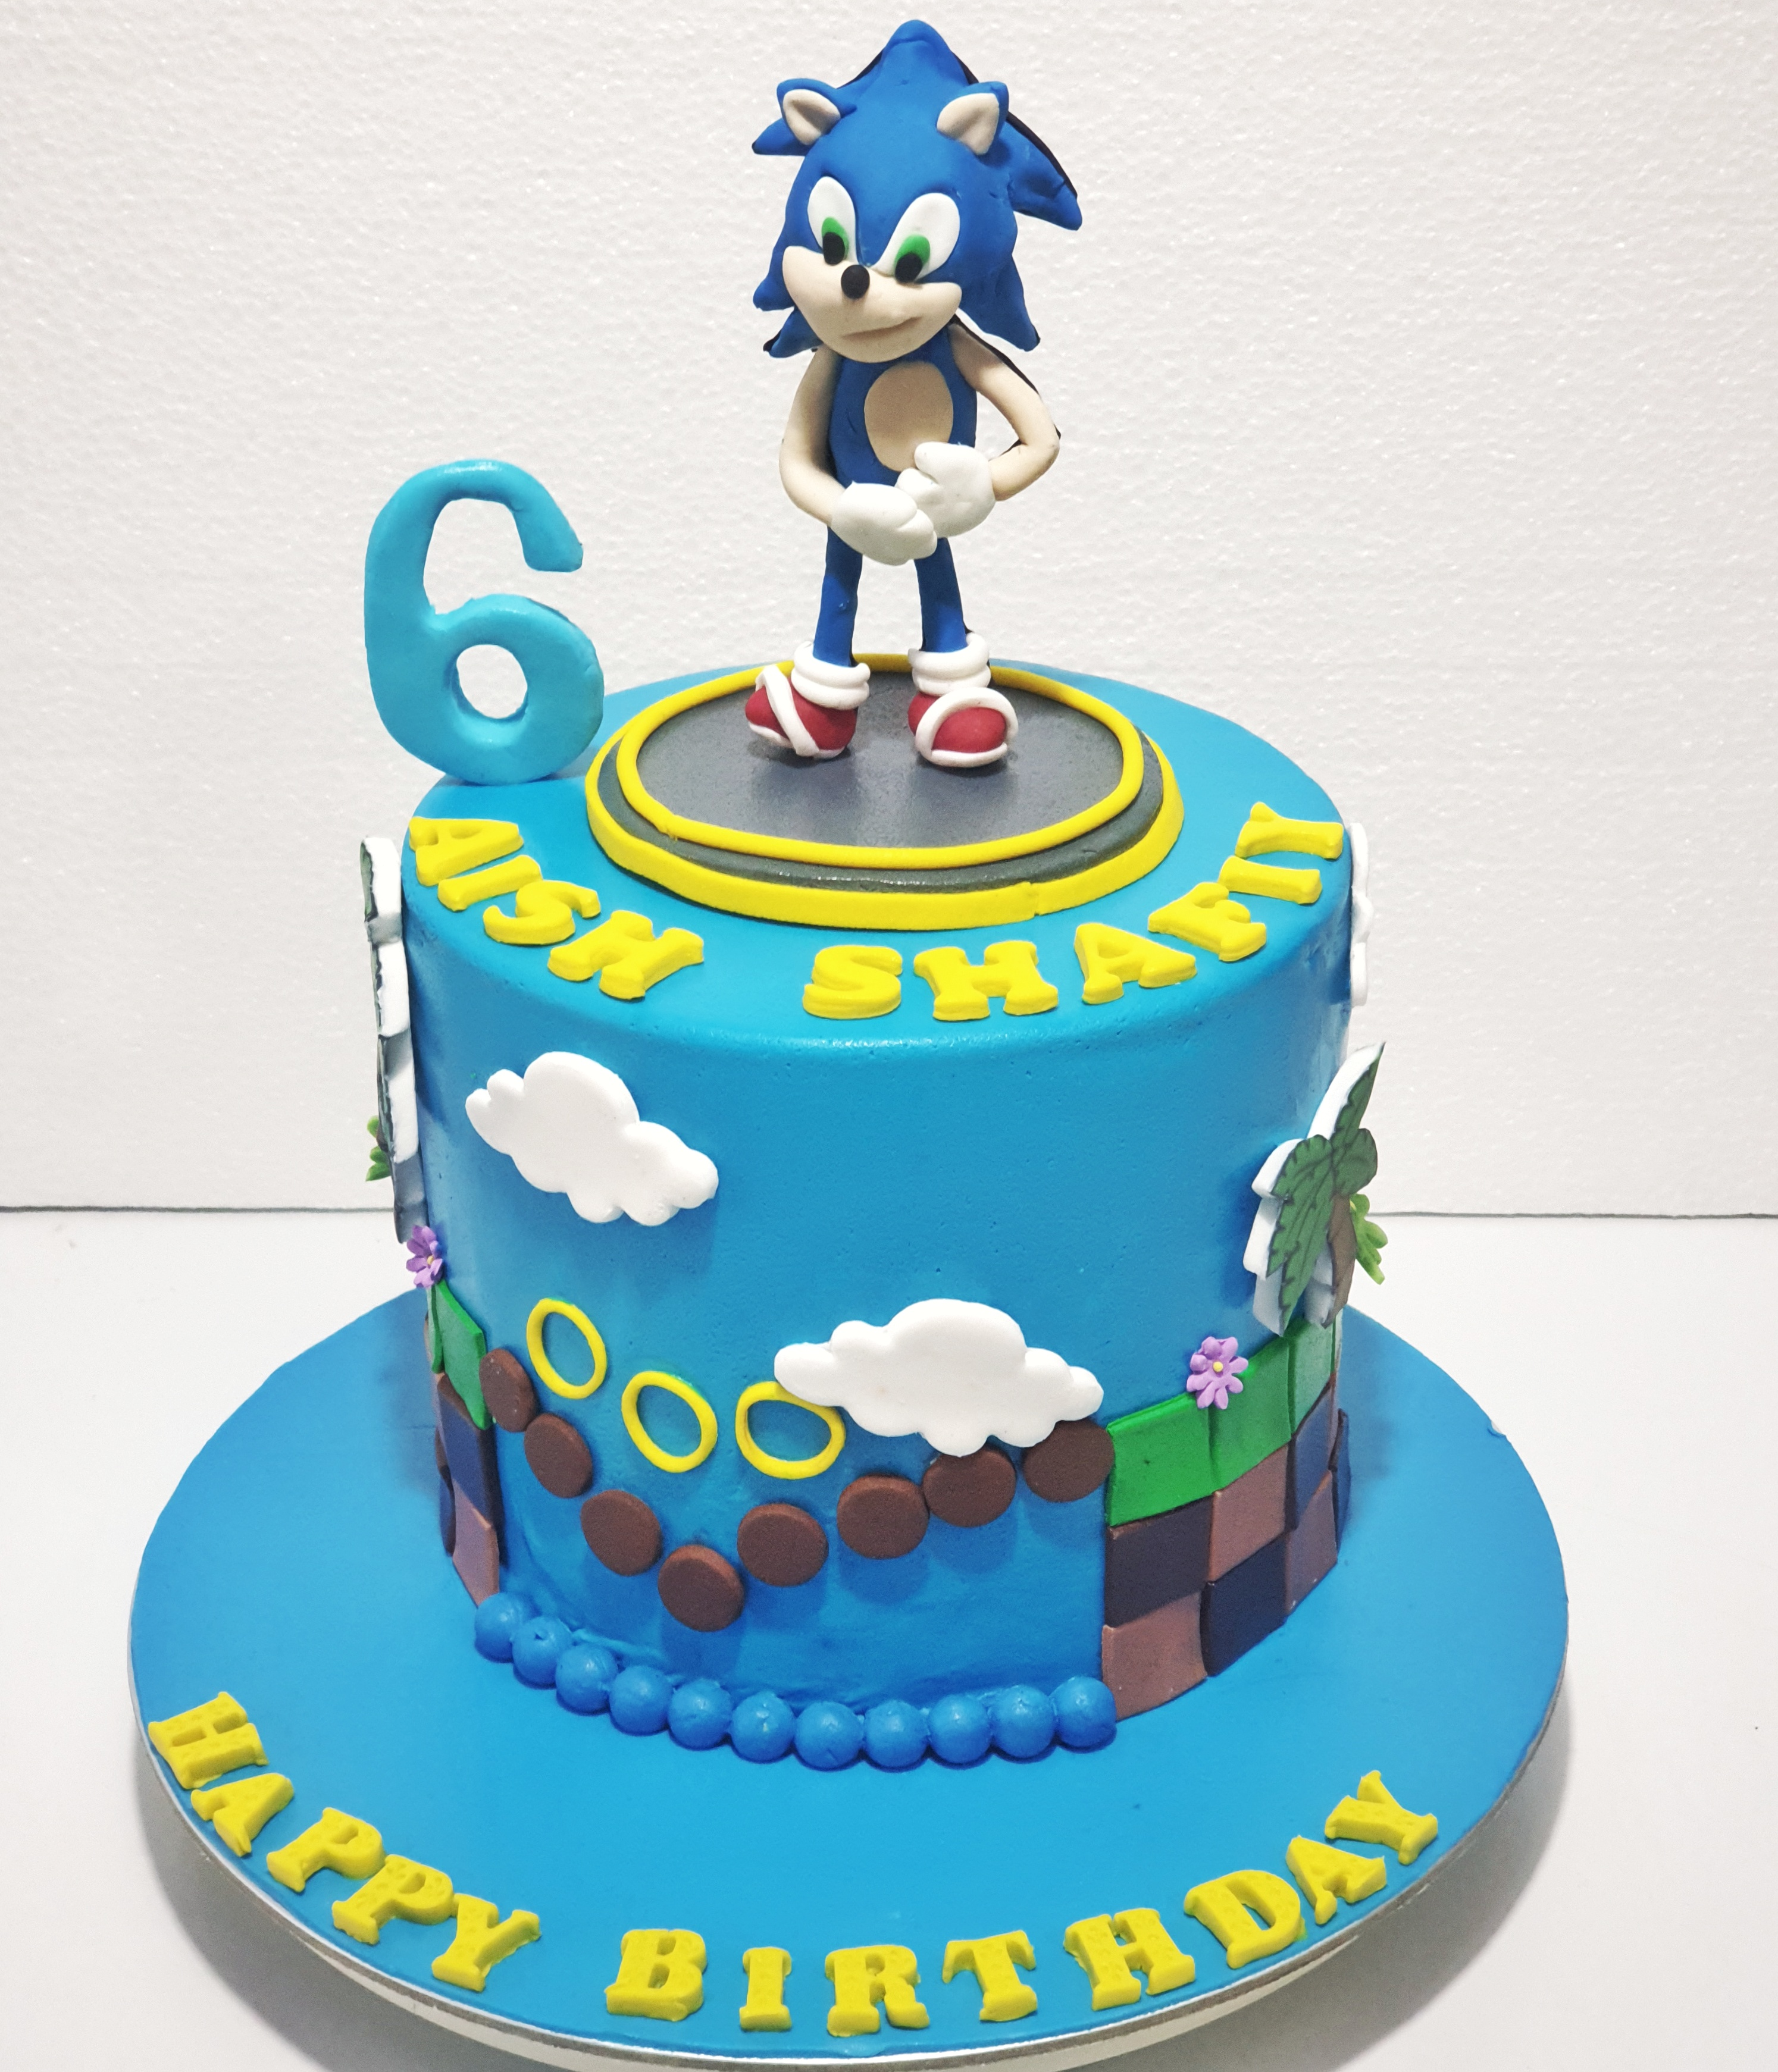 Groovy Sonic Hedgehog Birthday Cake Sooperlicious Cakes Funny Birthday Cards Online Elaedamsfinfo